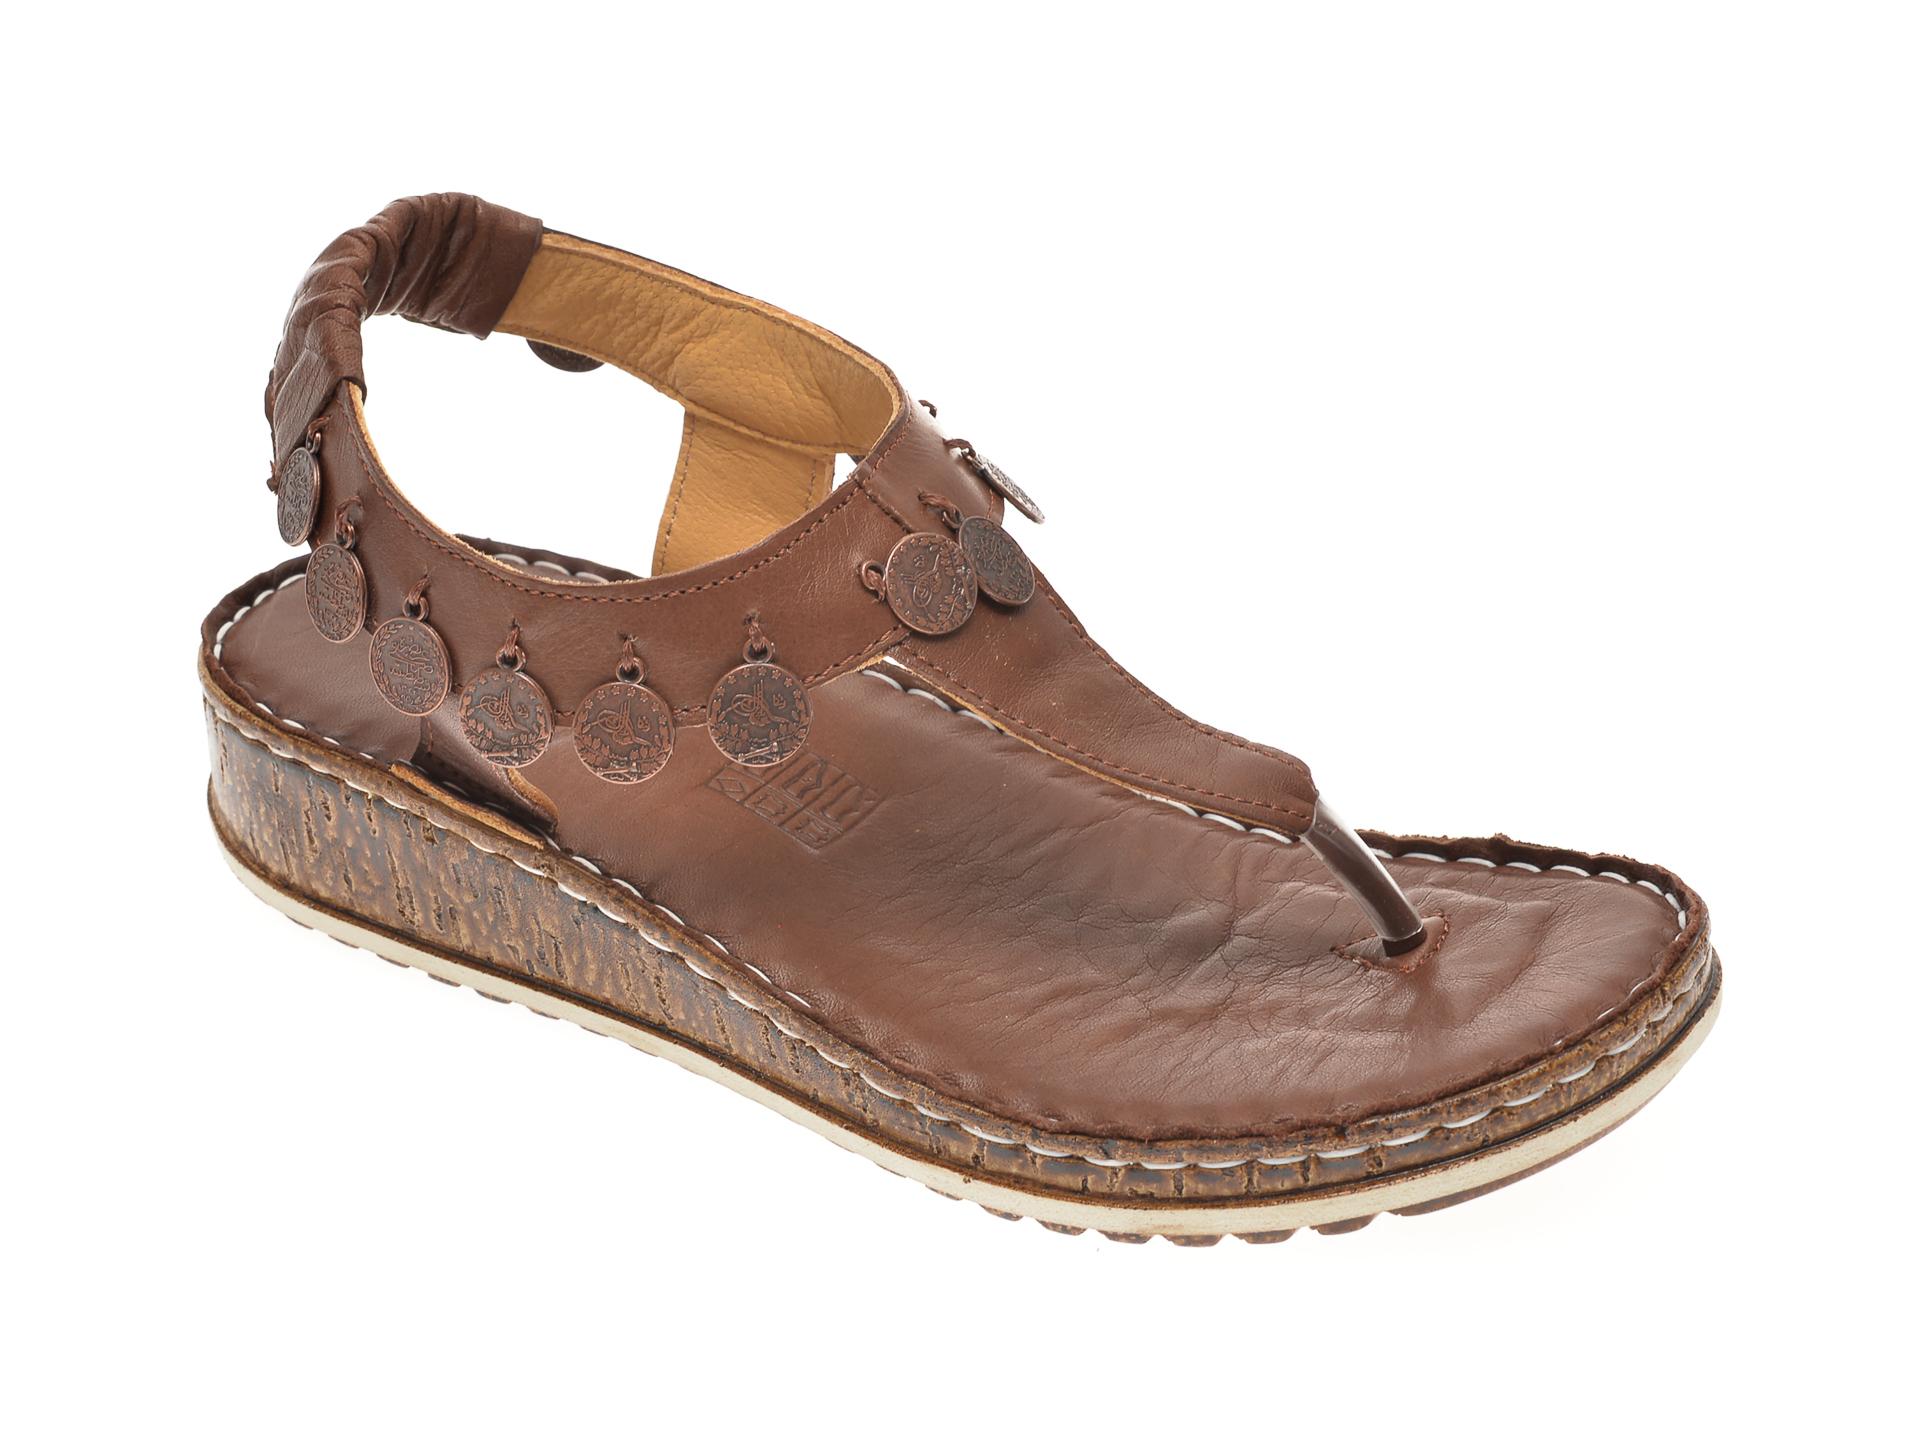 Sandale SINESTRESS maro, 1316A, din piele naturala